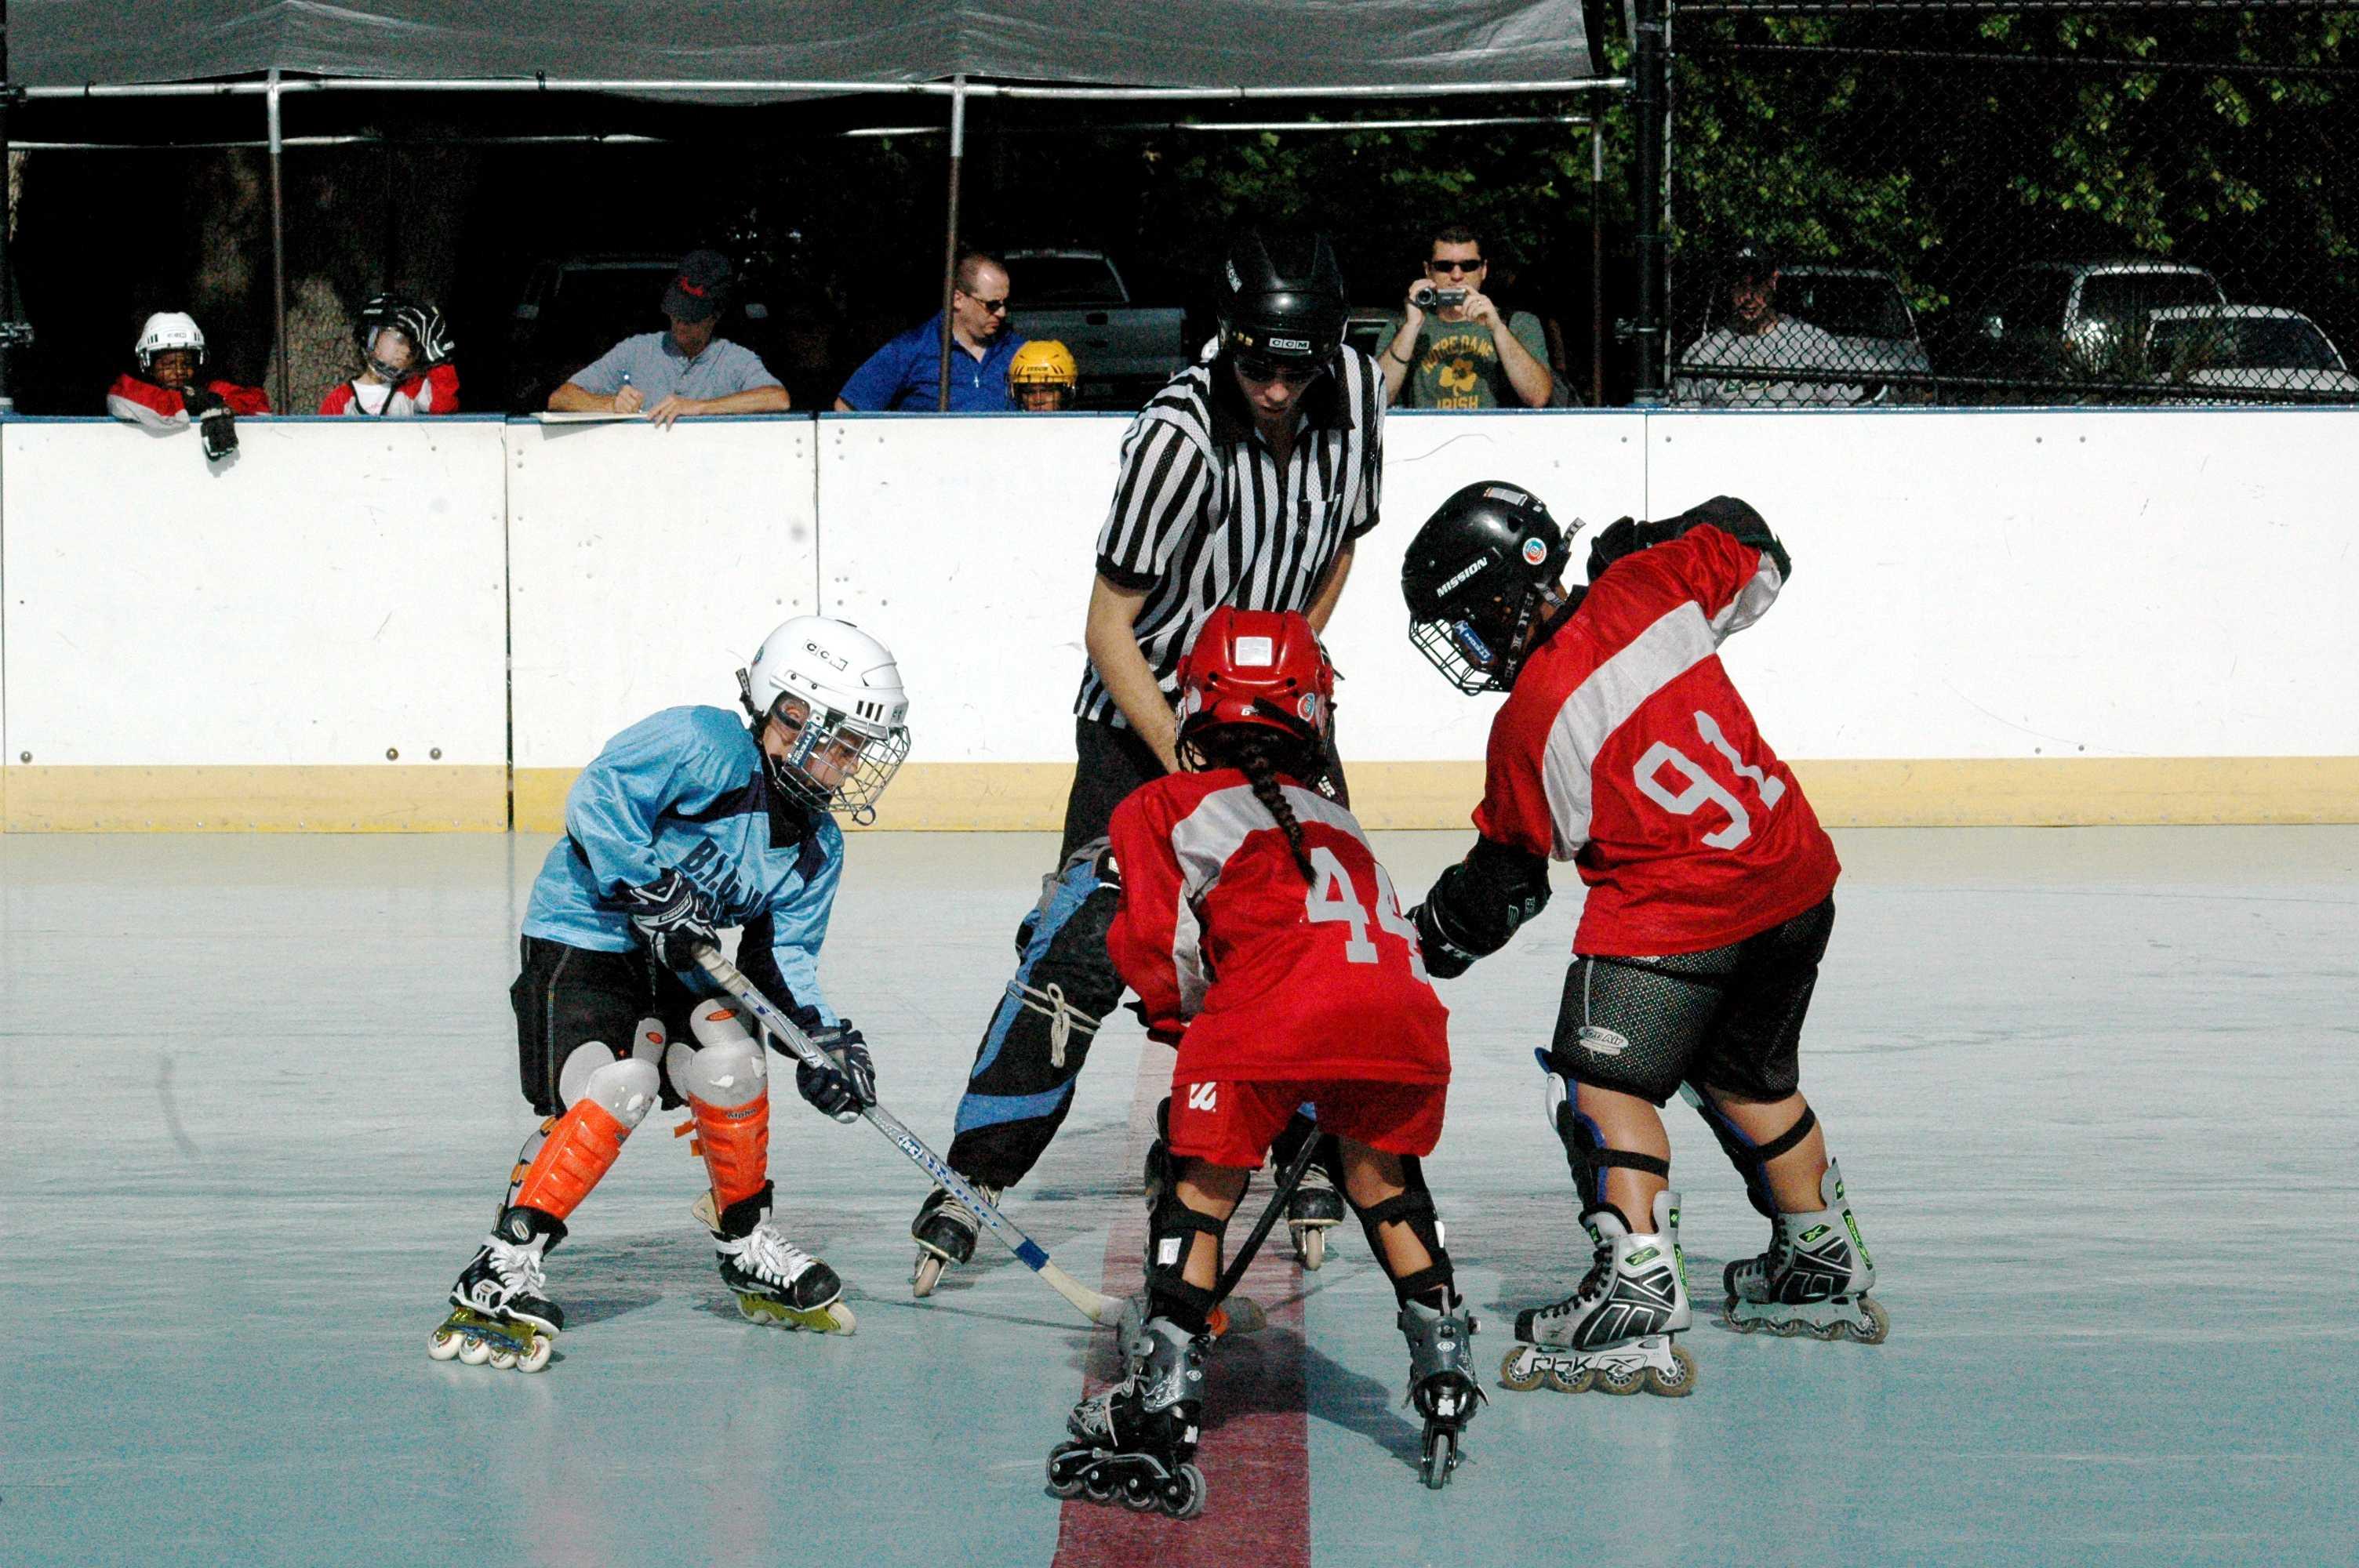 Lakeland Roller Hockey League Lakeland Lacrosse